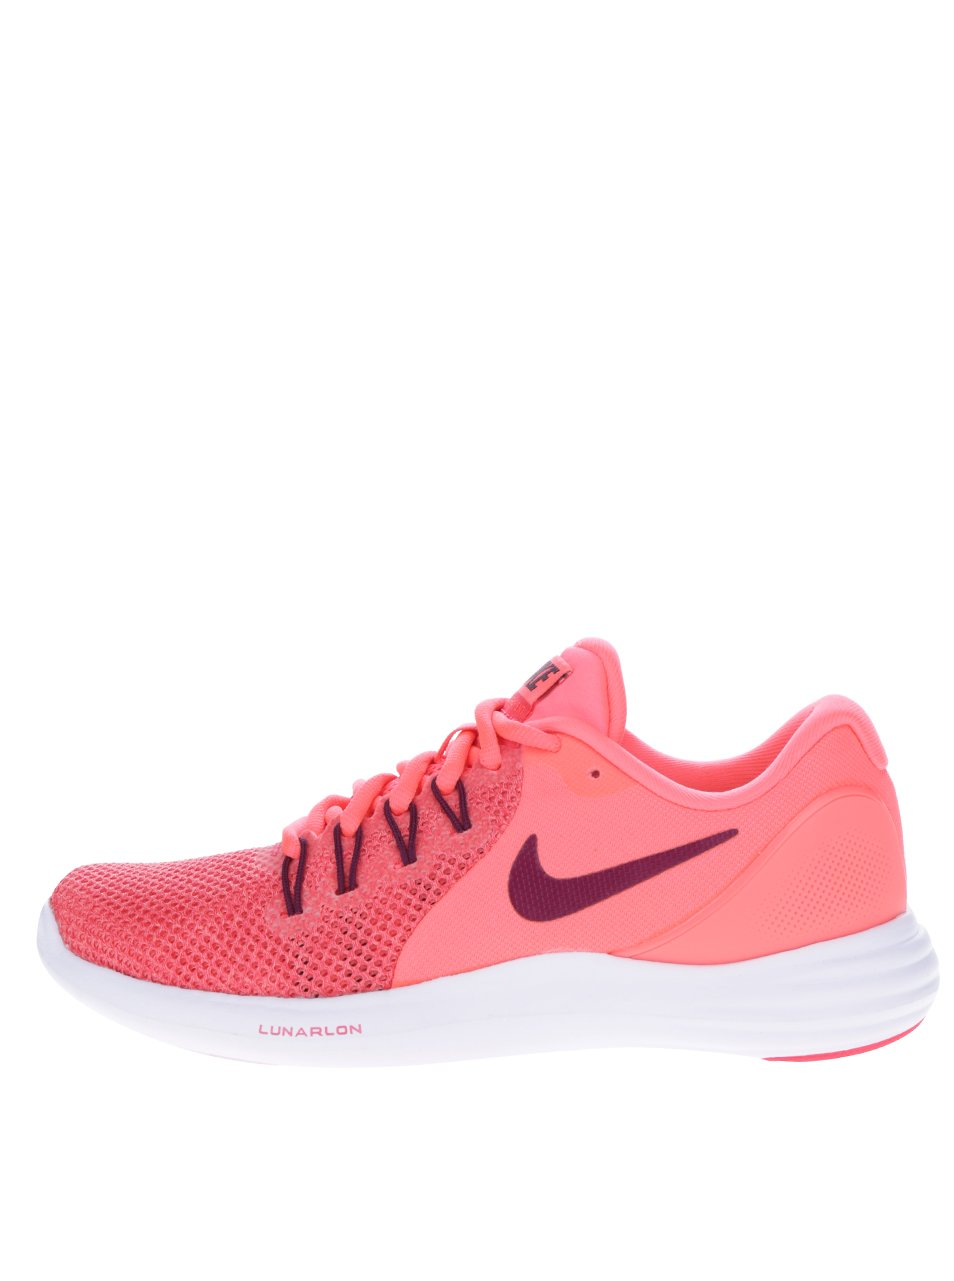 Neonově růžové dámské perforované tenisky Nike Lunar Apparent